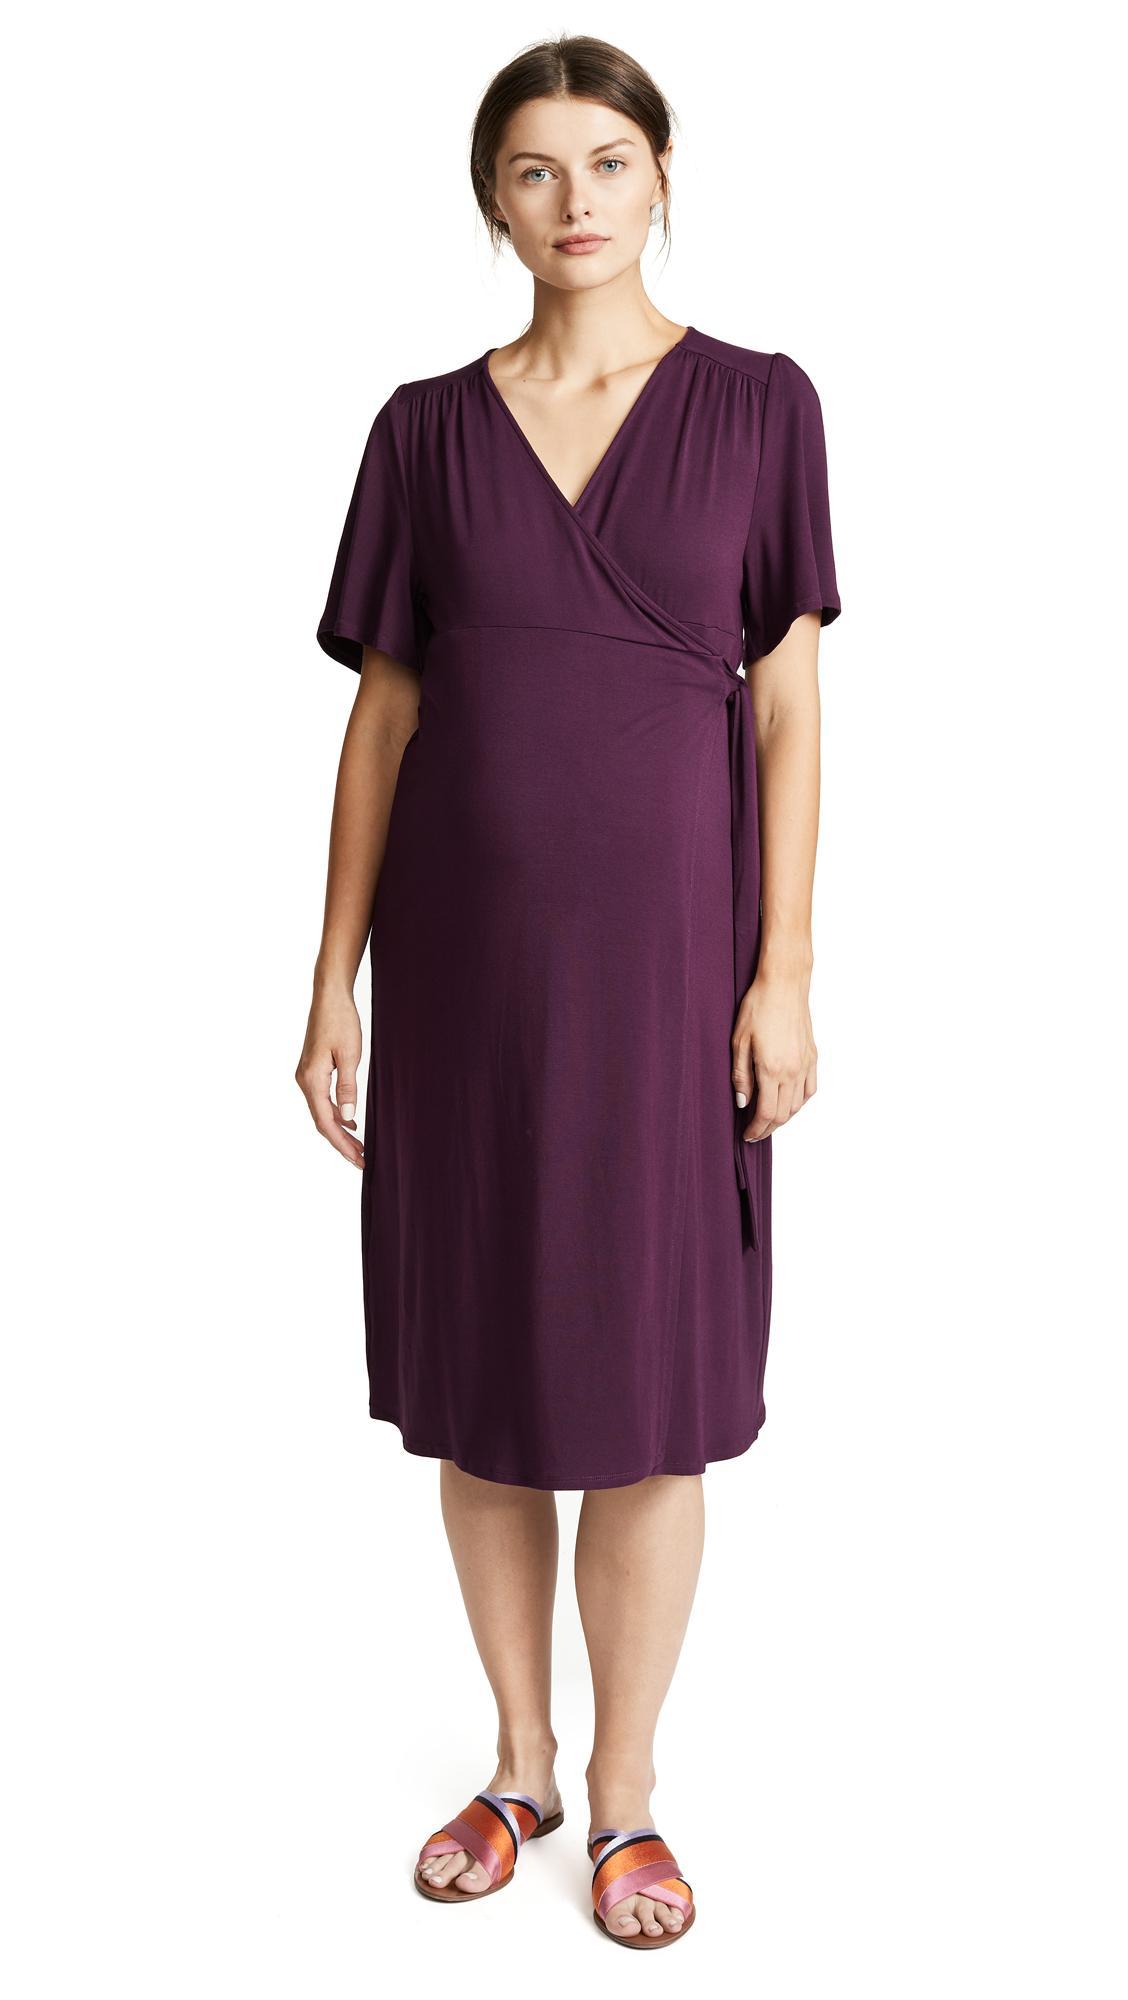 3b38cc6820 Ingrid   Isabel Flutter Sleeve Knit Maternity Wrap Dress In Plum ...